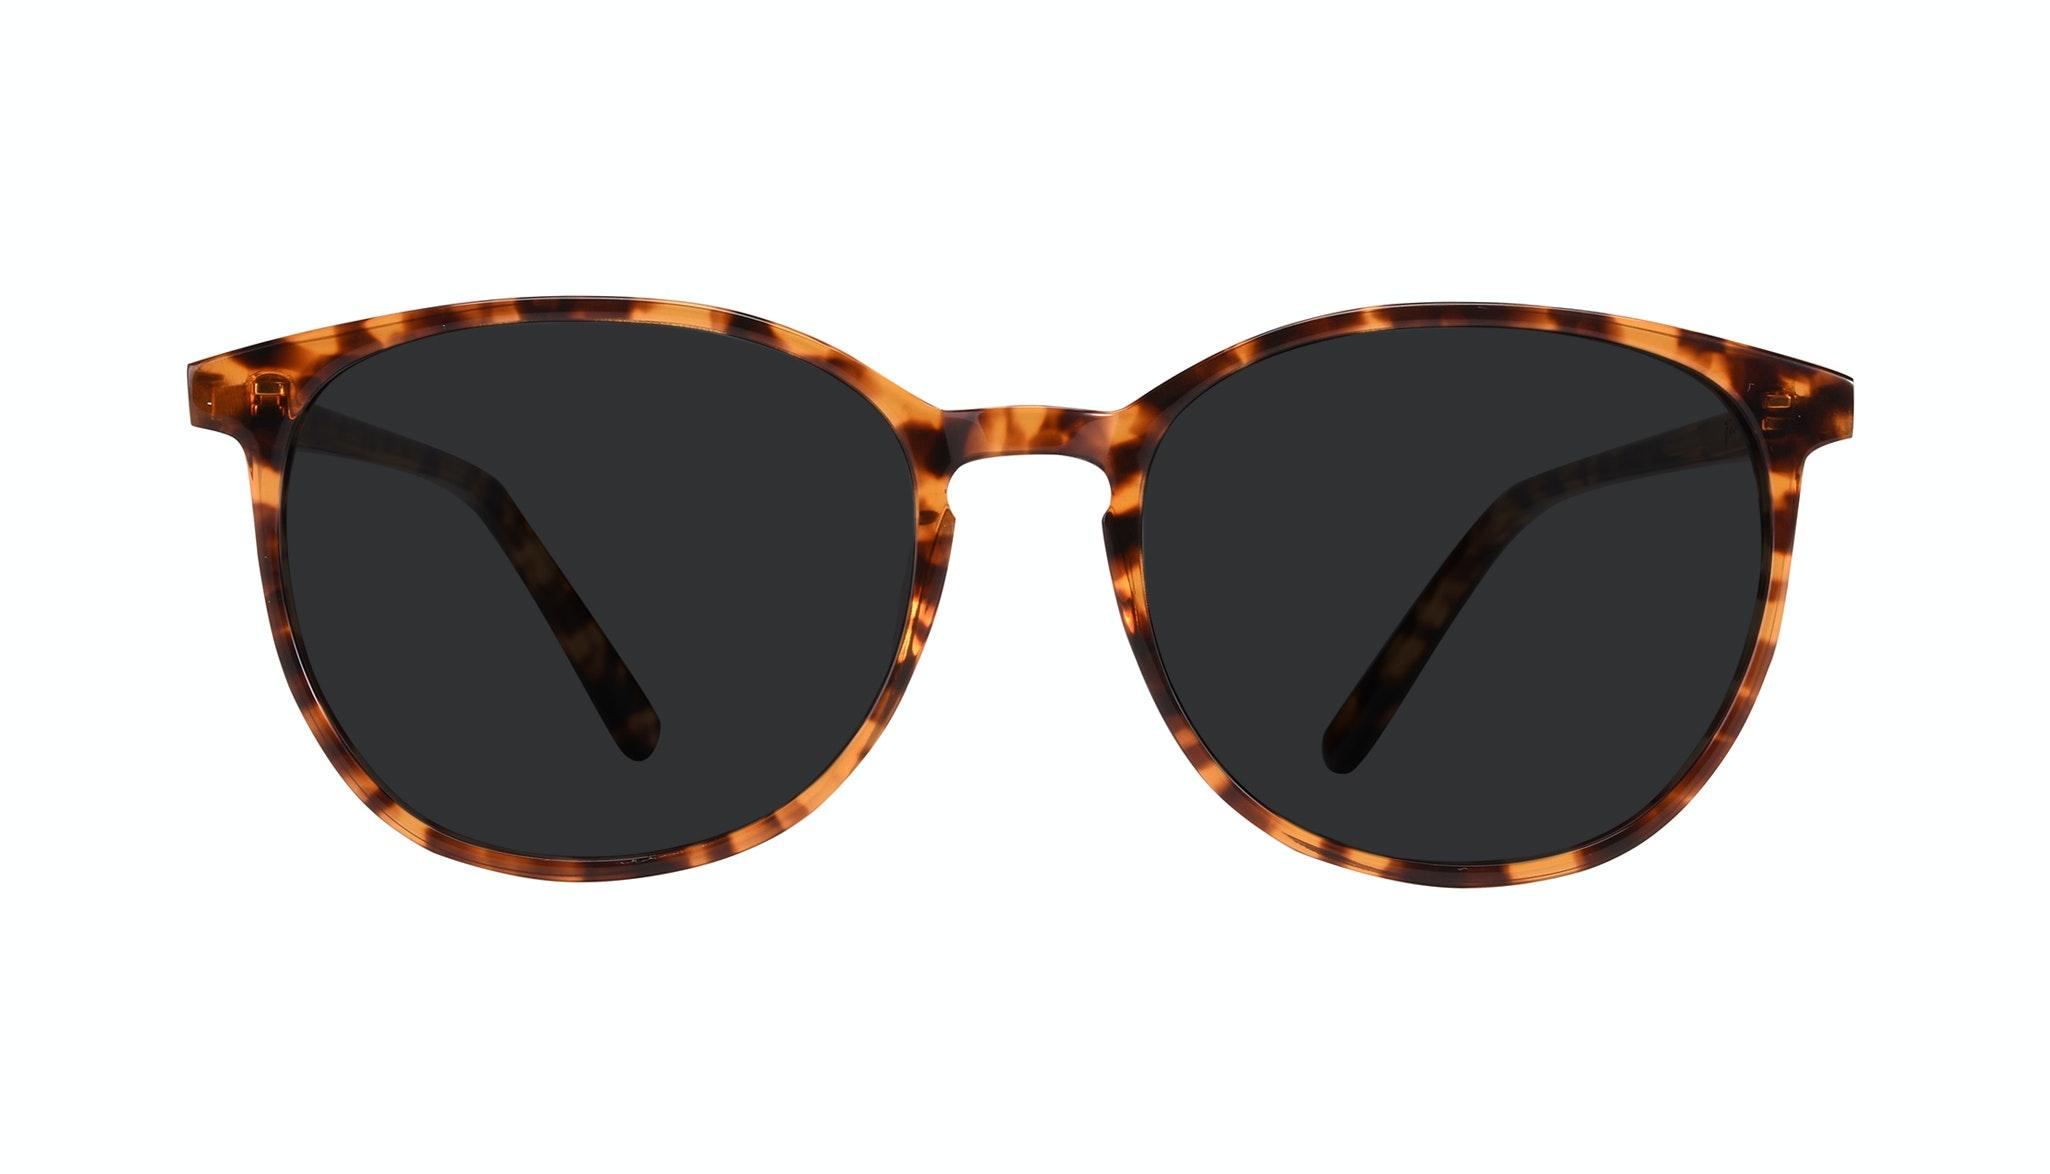 Affordable Fashion Glasses Round Sunglasses Women Femme Libre Josette Front